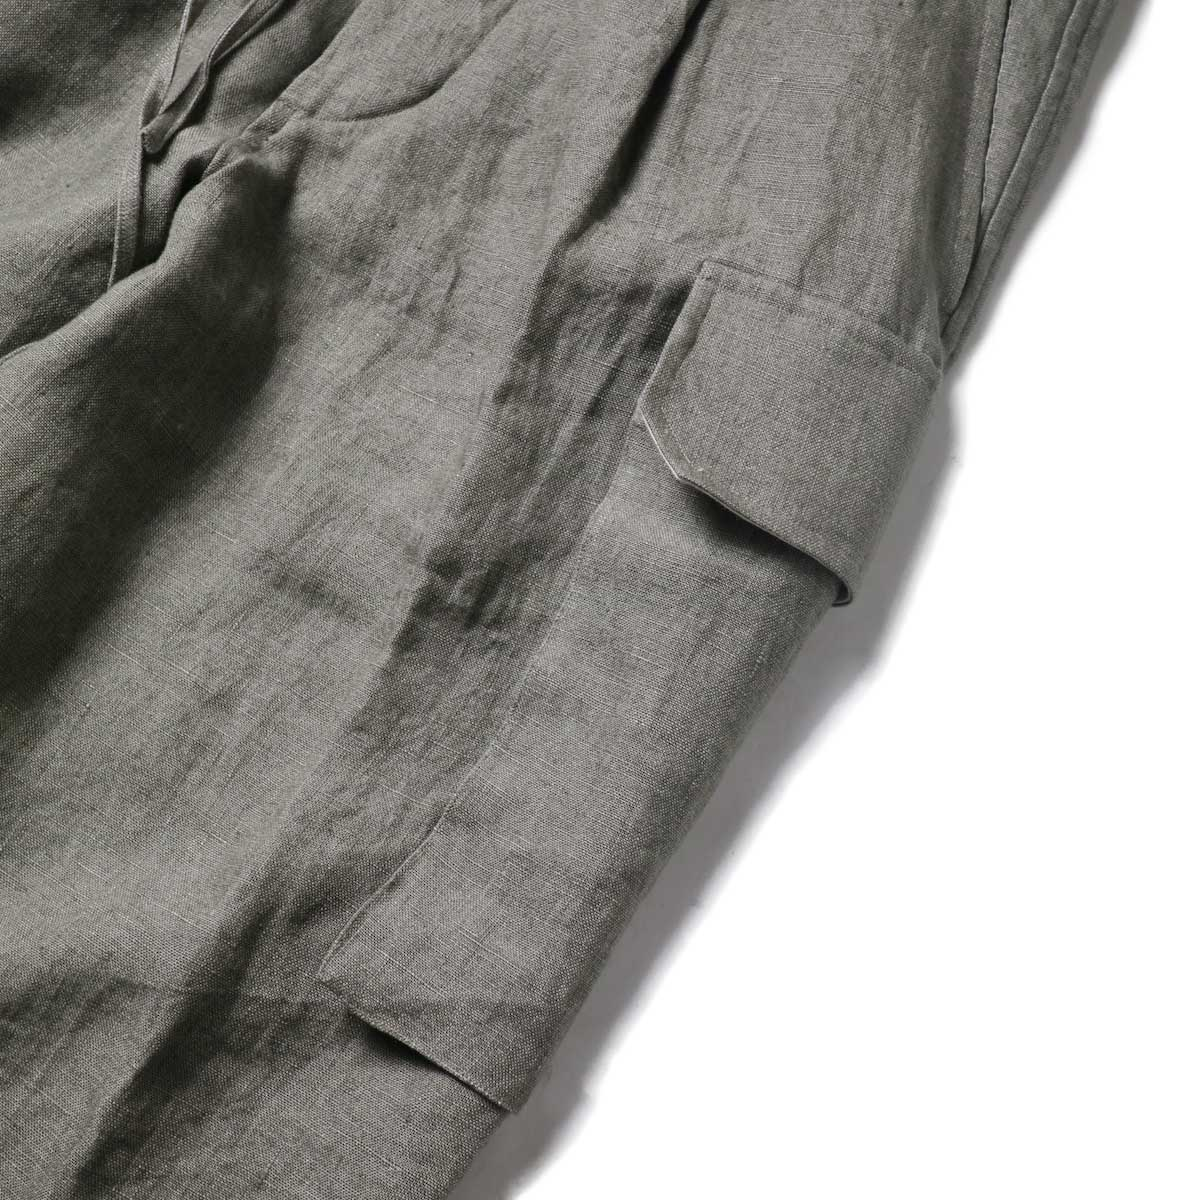 Blurhms / Wash Linen 5P Easy Pants (KhakiGrey)ポケット